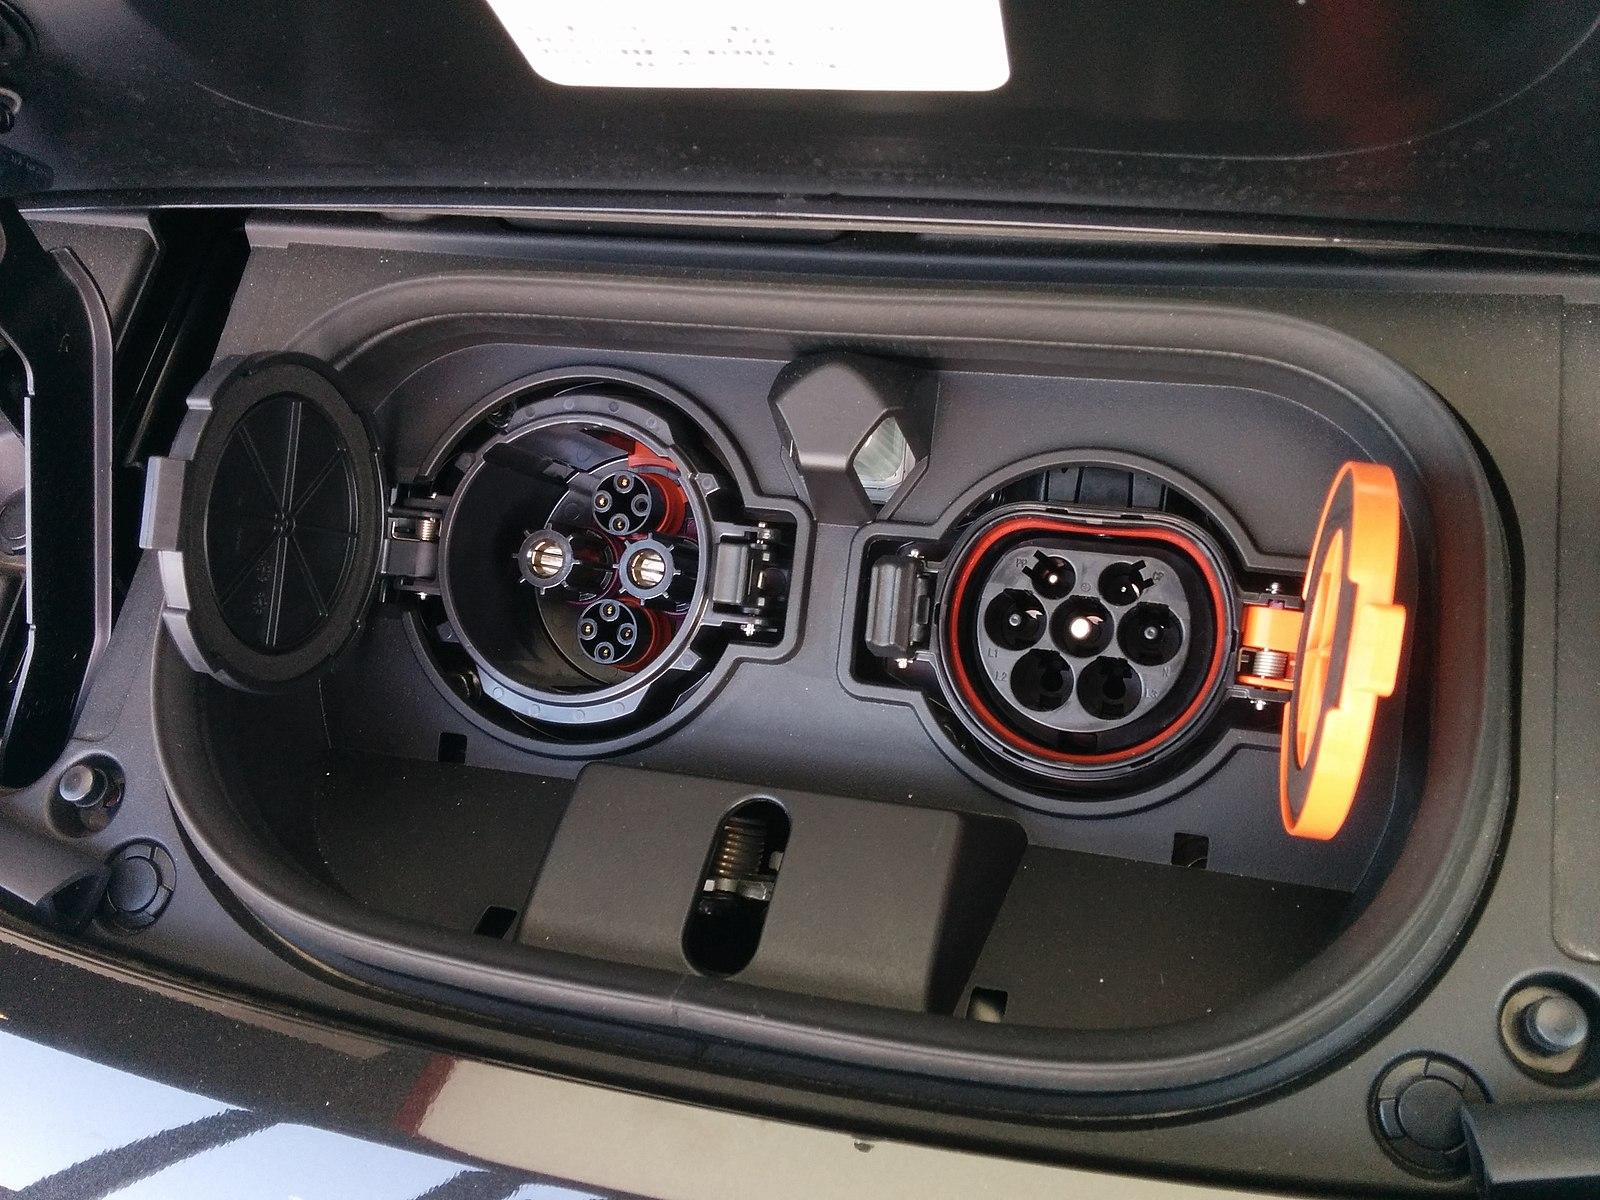 CCS, chademo, type 2, charging, car, ev, nissan leaf,